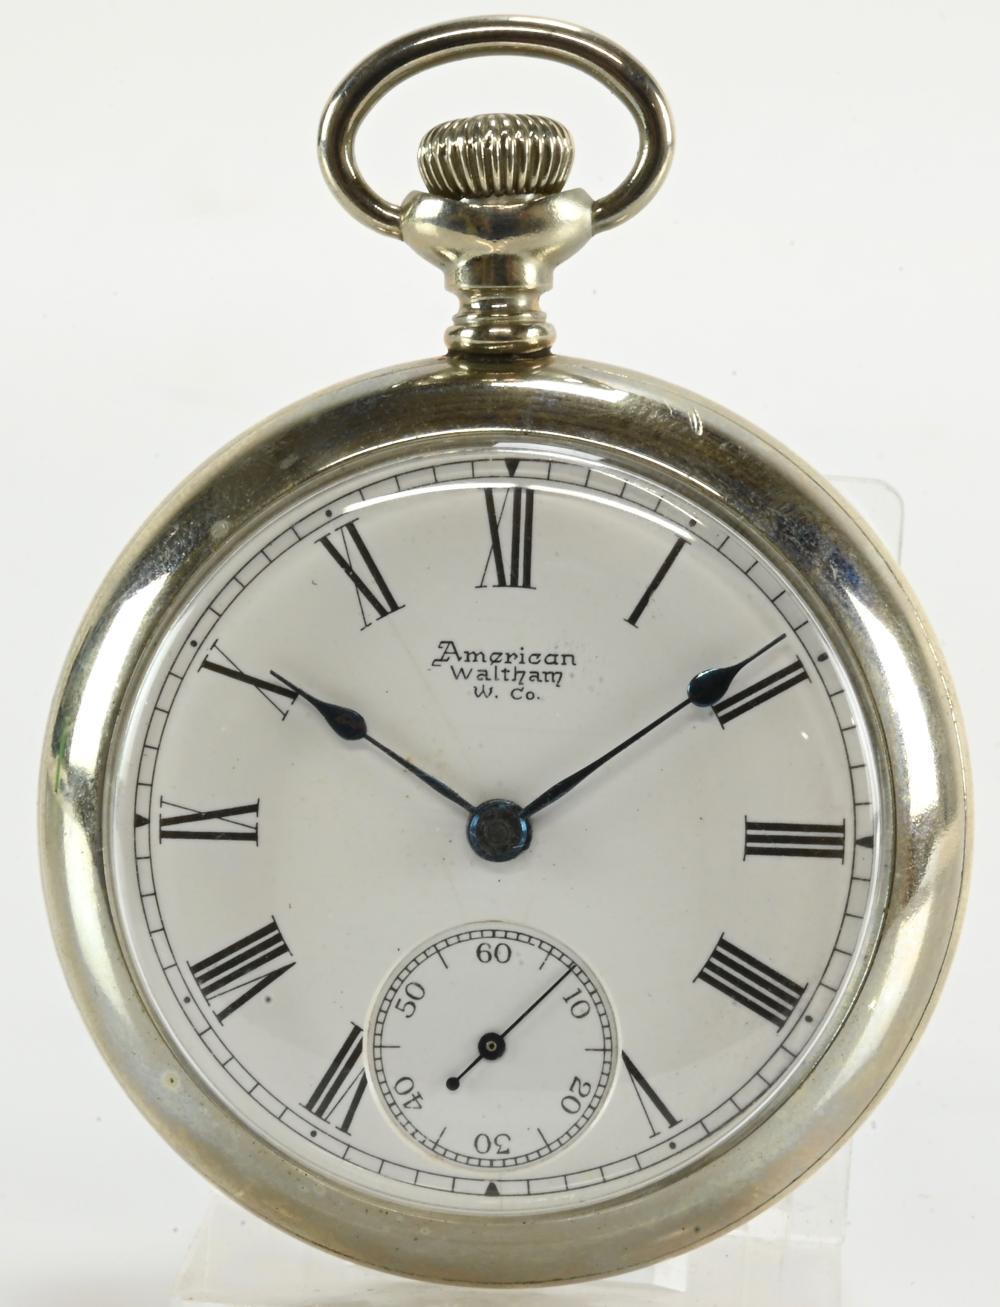 American Waltham Watch Co. Pocket Watch